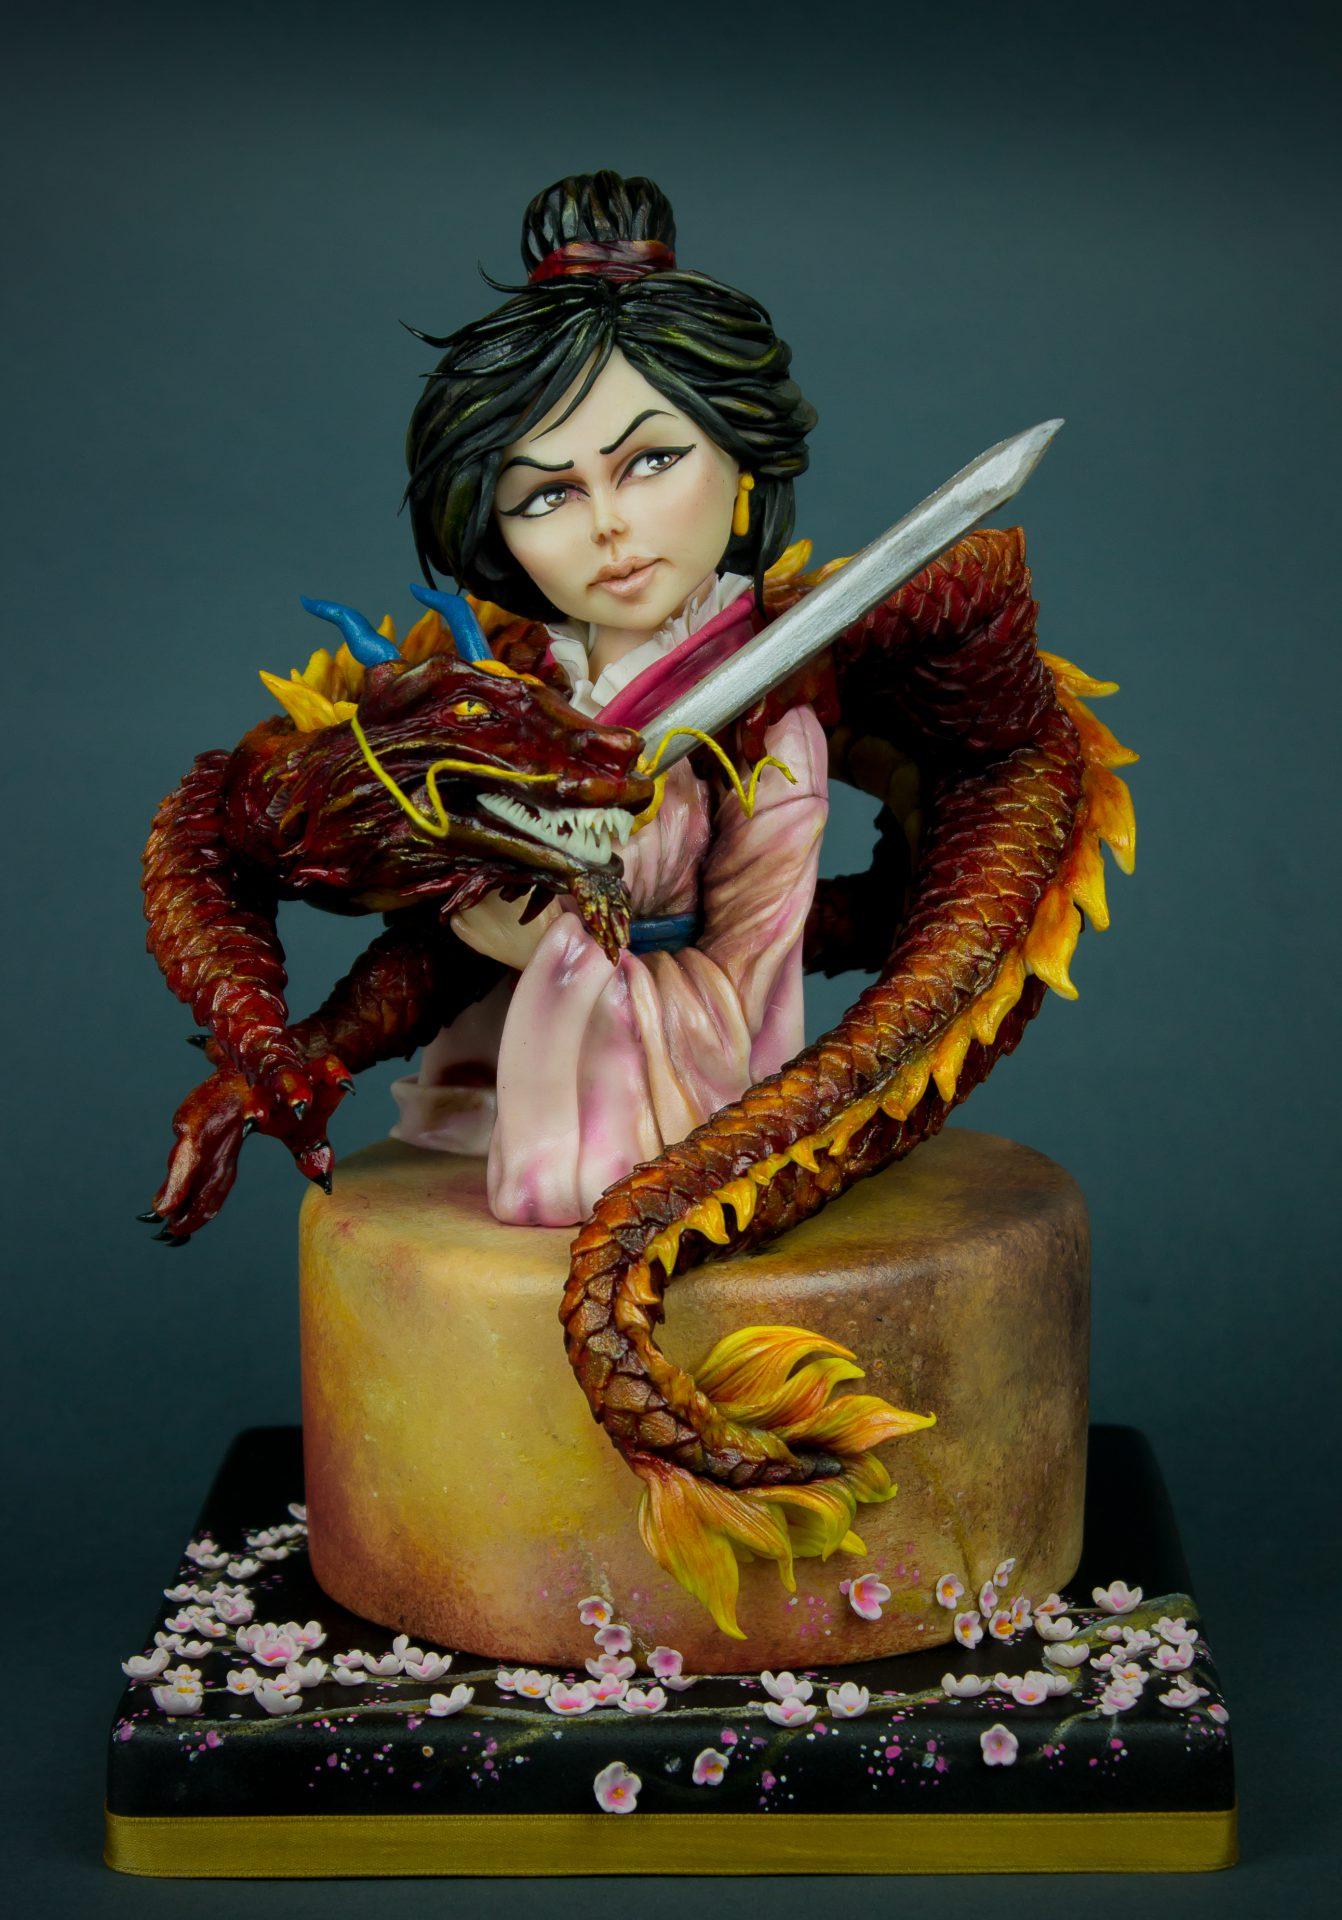 Disney Deviant Sugar Art Cake Collaboration in Cake Masters Magazine